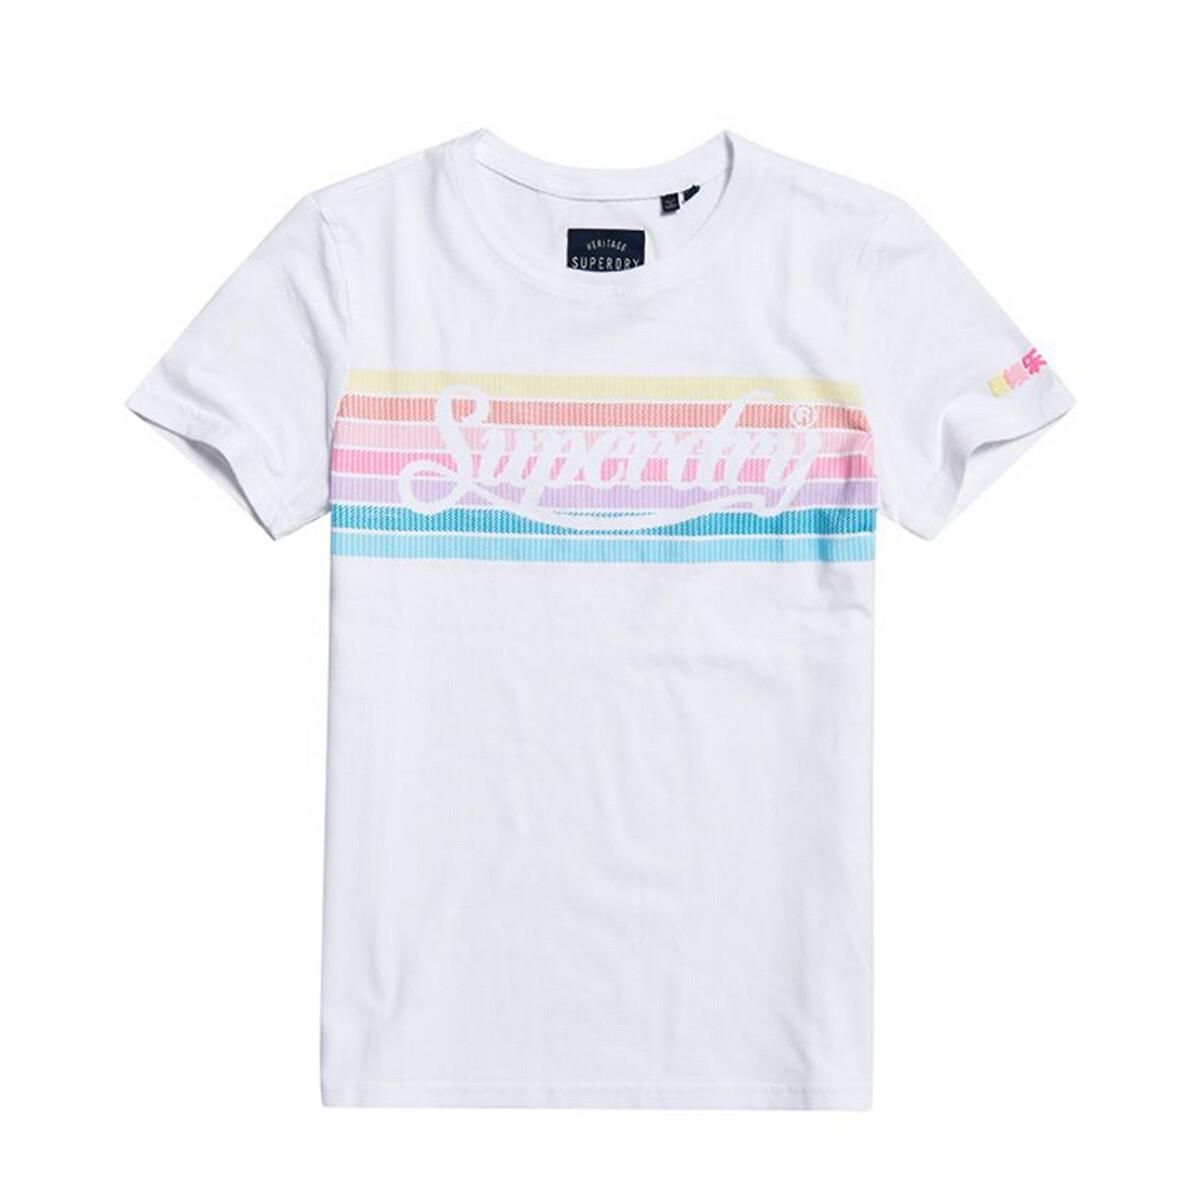 Camiseta de manga corta con logotipo arcoíris